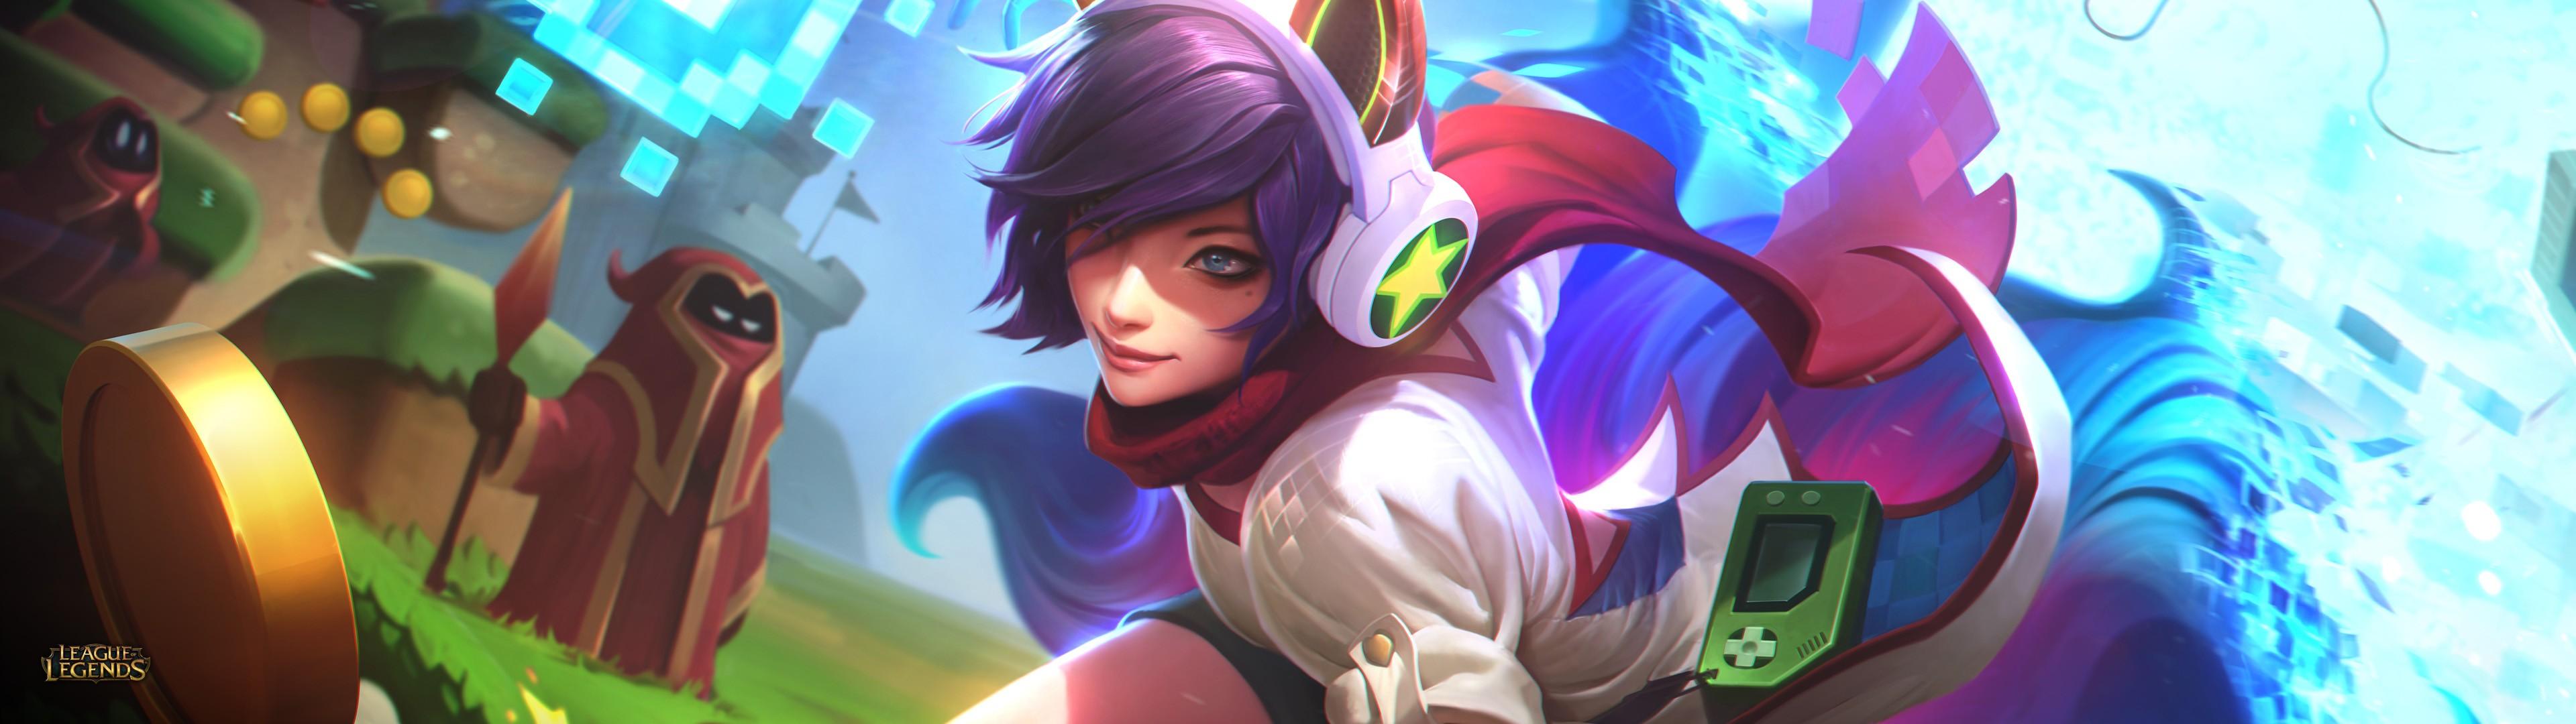 General 3840x1080 arcade skins League of Legends PC gaming fantasy girl purple hair headphones